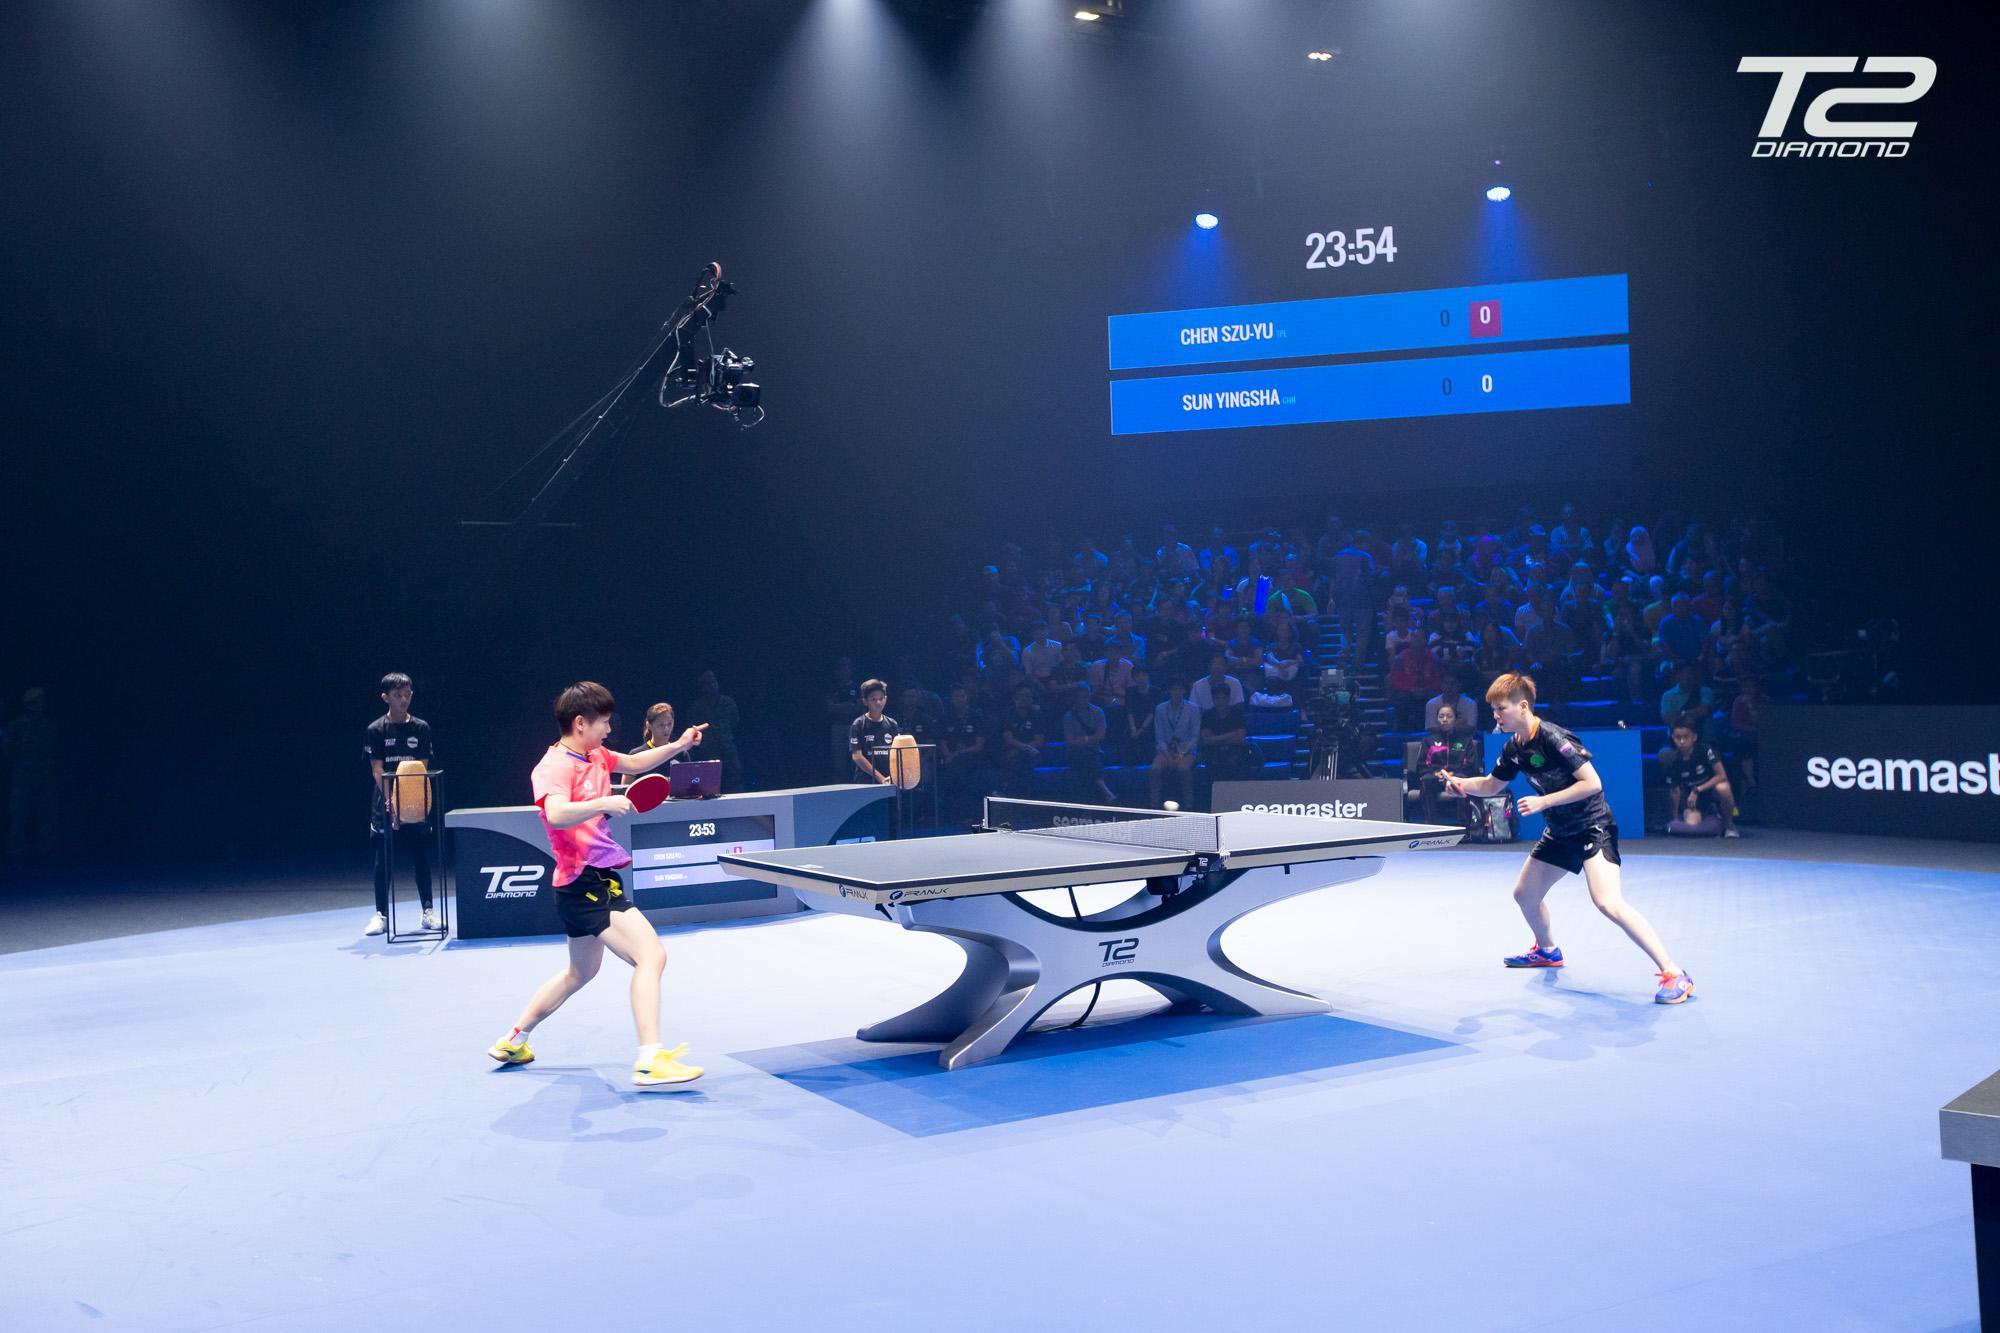 20190718_Match6_R16_CHENszuyu_vs_SUNyingsha_00608 _WEBRES